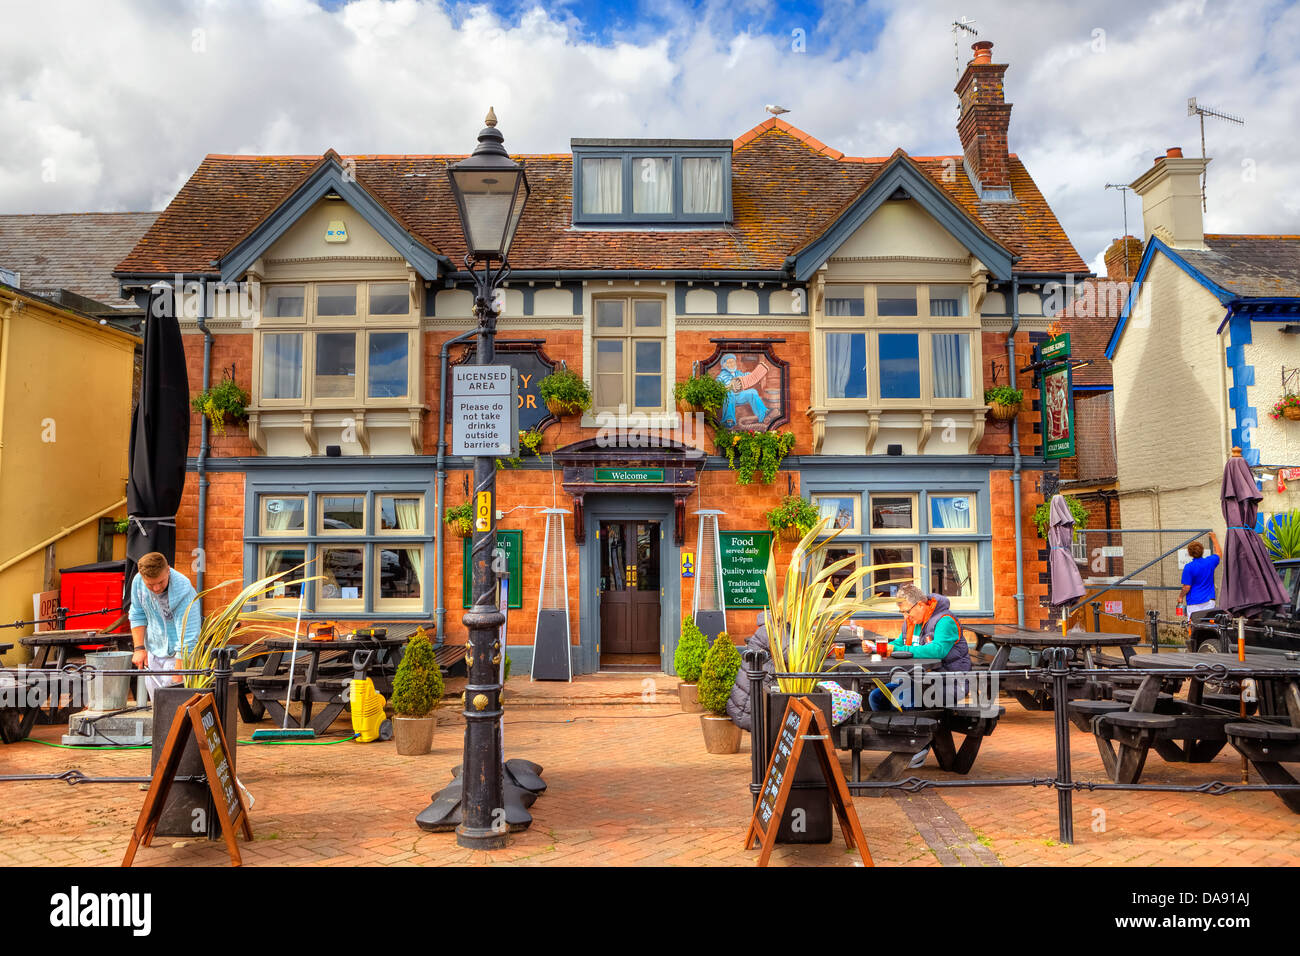 pub on the Poole Quay, Dorset, United Kingdom - Stock Image